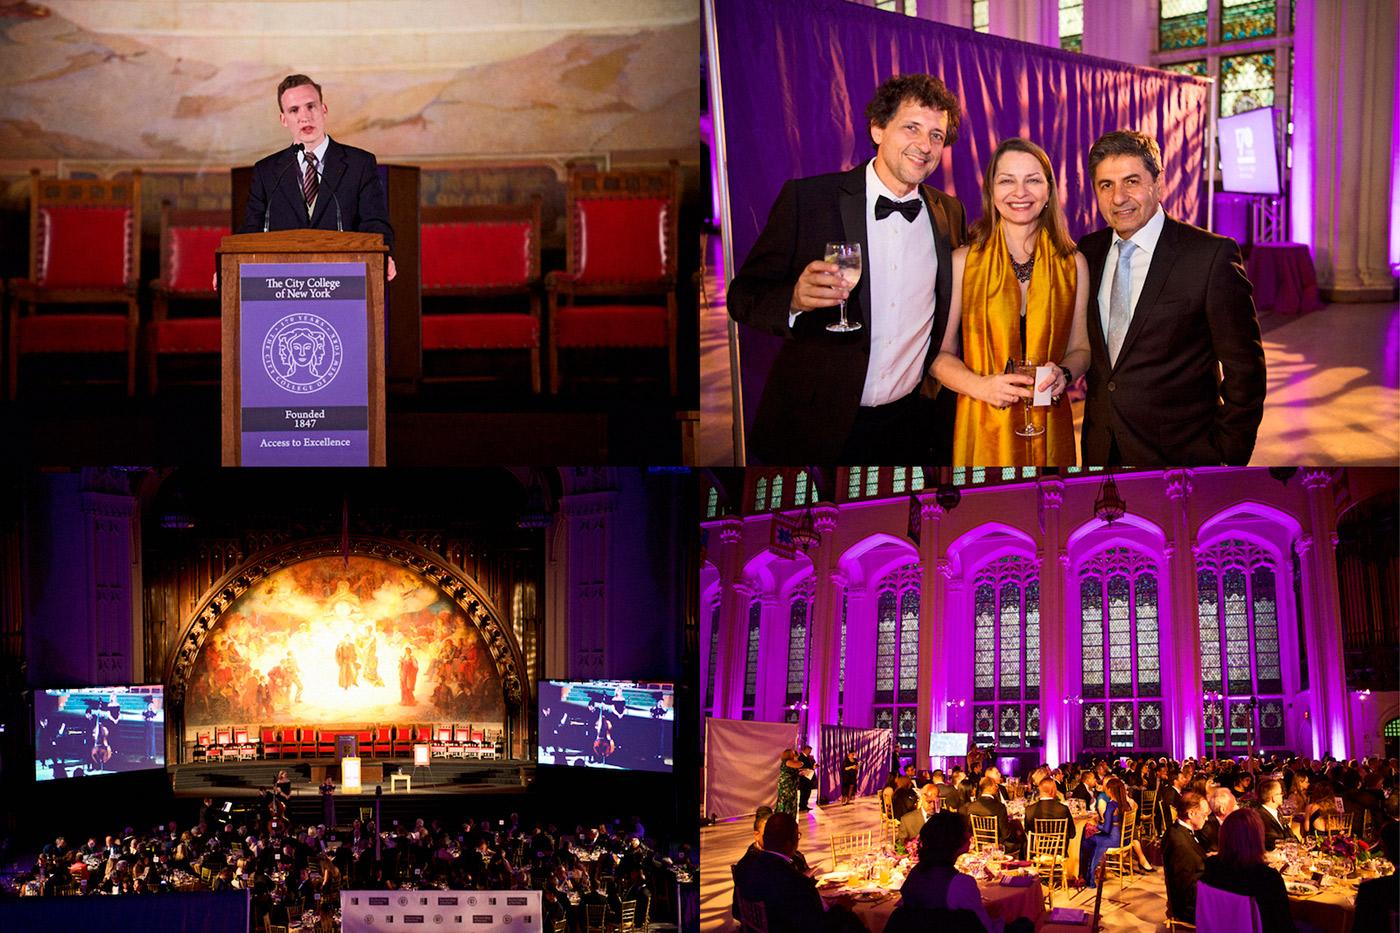 Branding CCNY - 170 Years, The City College of New York